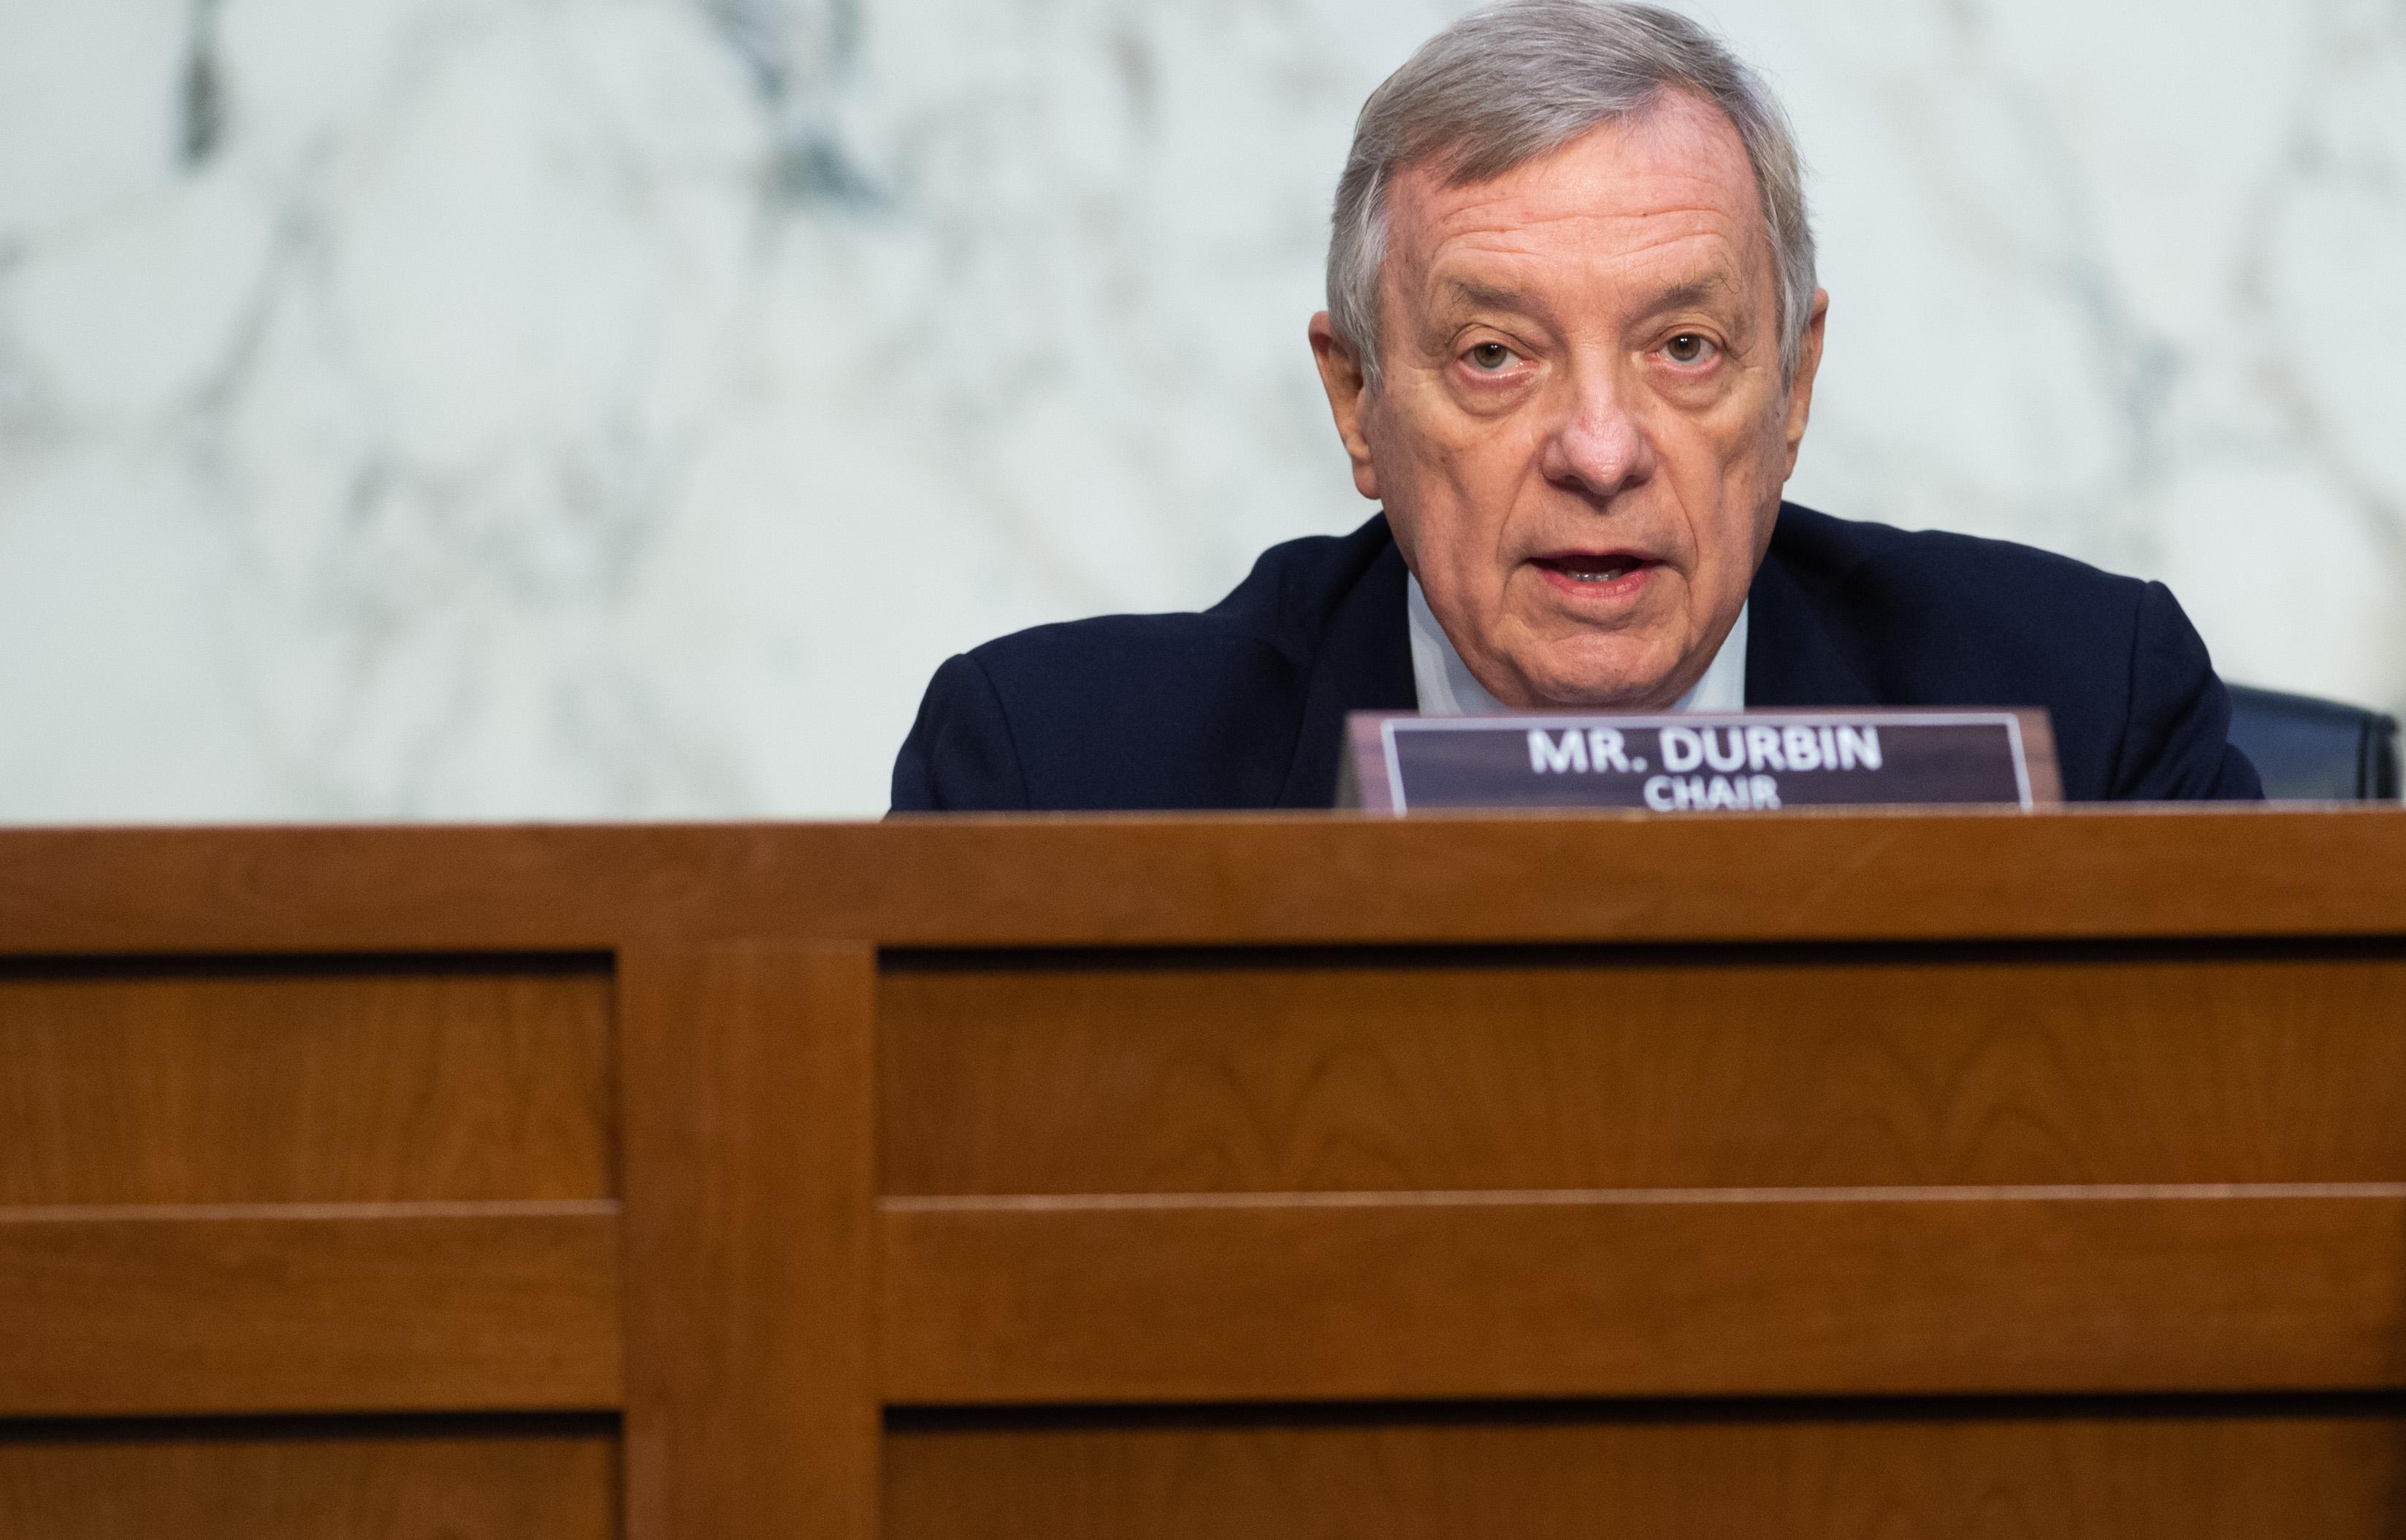 Sen. Dick Durbin, D-Ill., chairman of the Senate Judiciary Committee, preside over a hearing